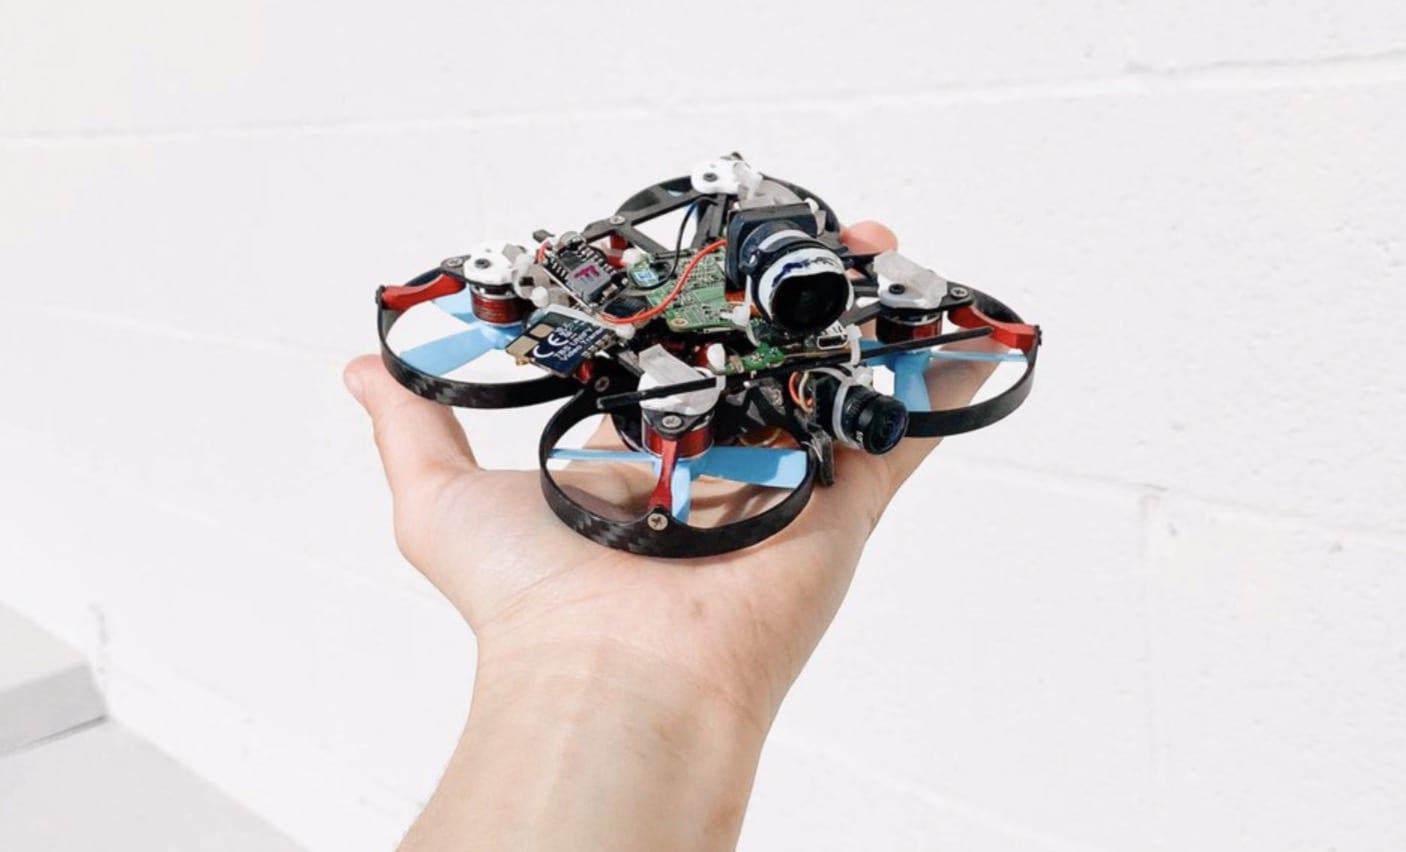 FPV drone-shot video